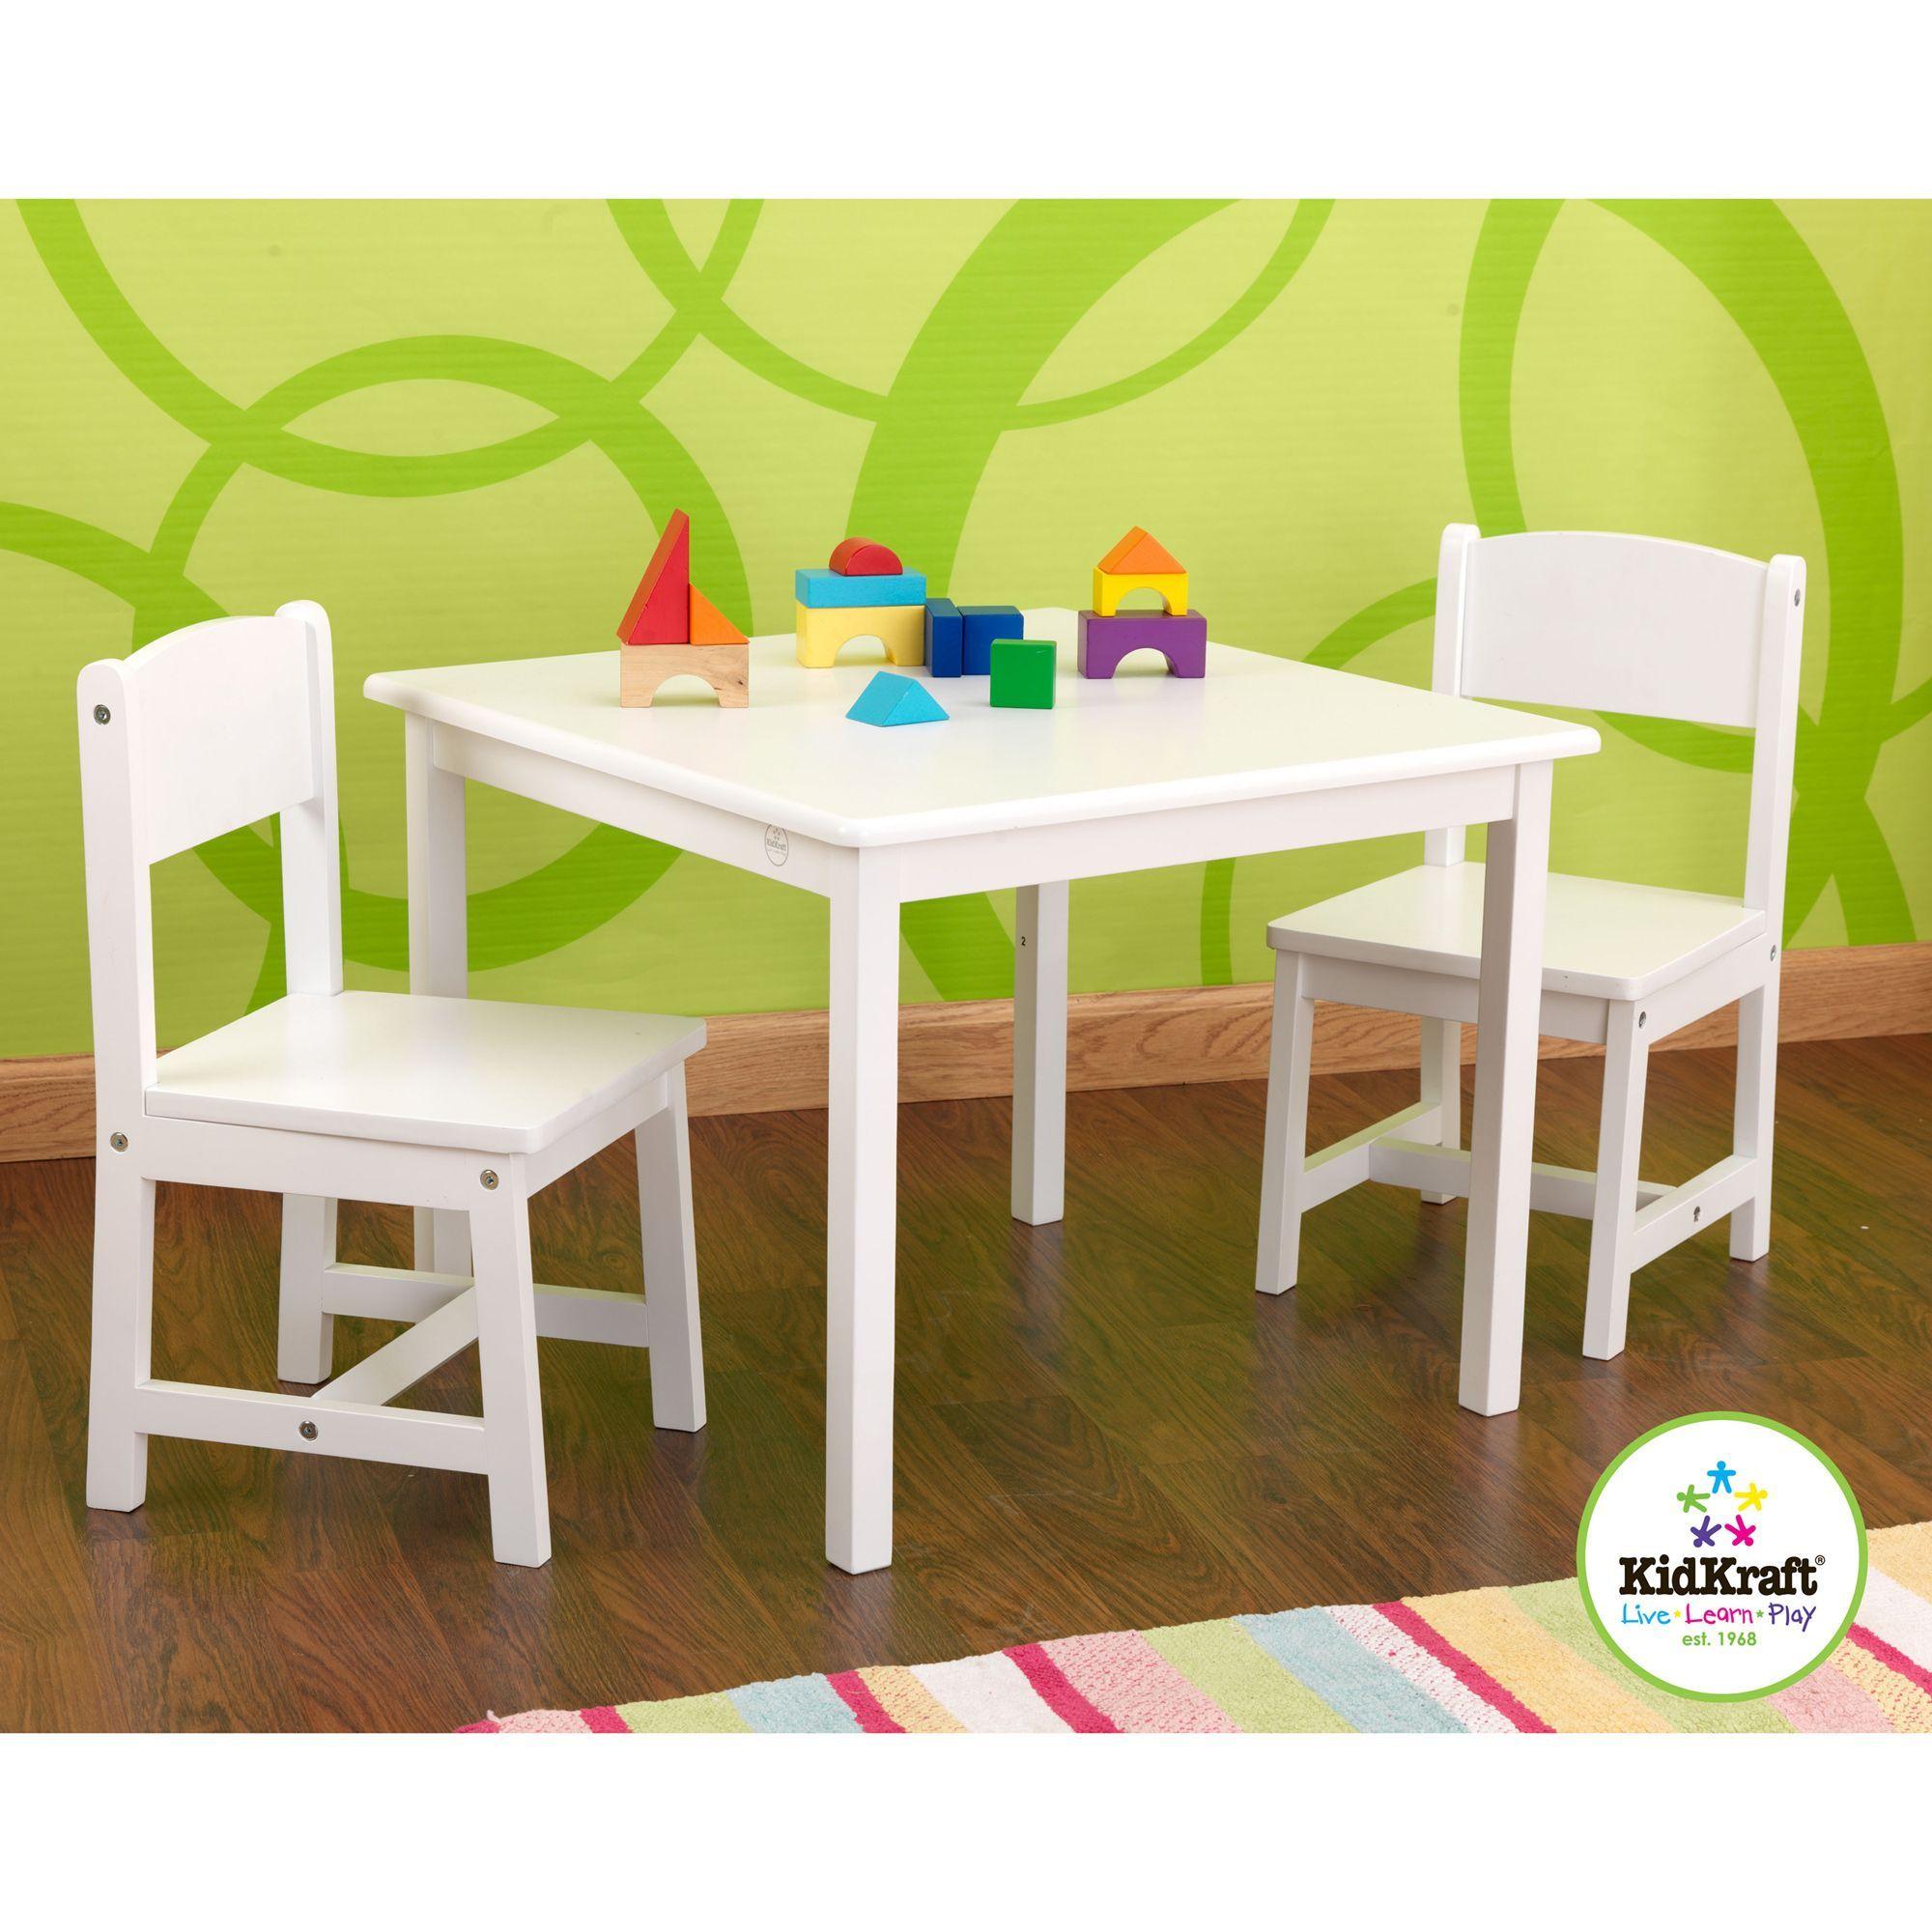 kidkraft white aspen table/chair set by kidkraft | best perfect